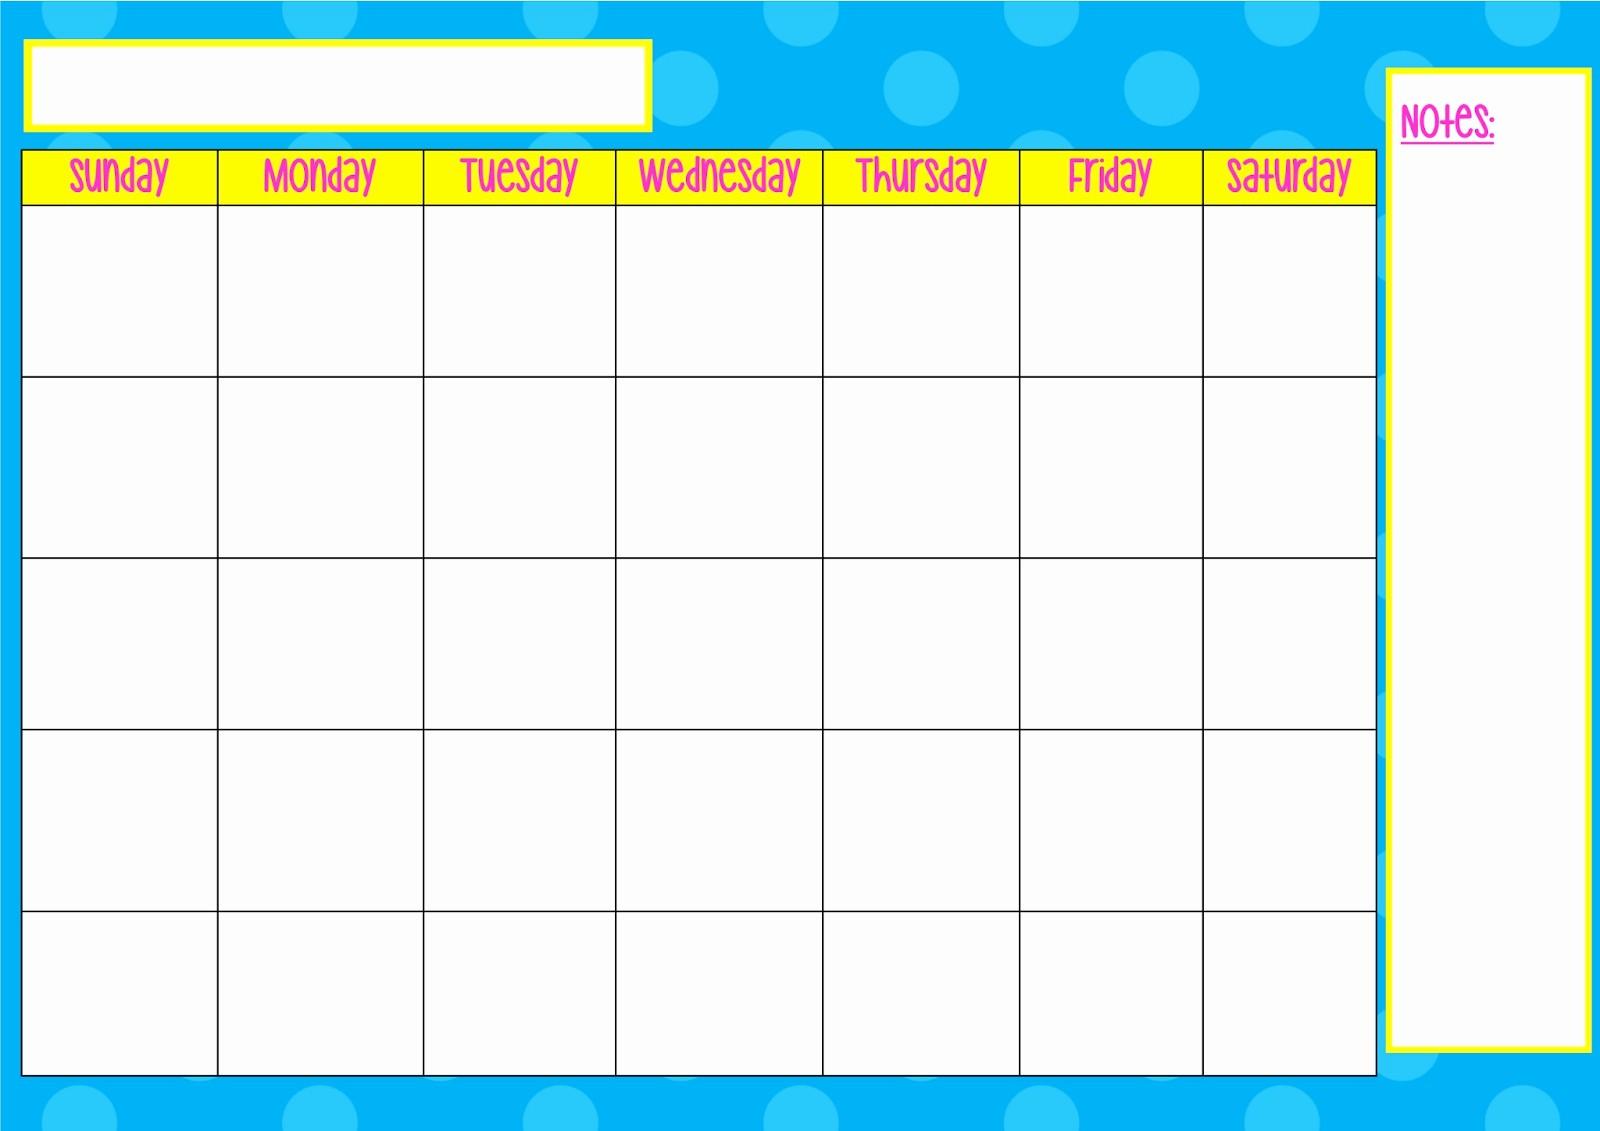 Monday Through Sunday Calendar Template Luxury Monday Through Sunday Calendar